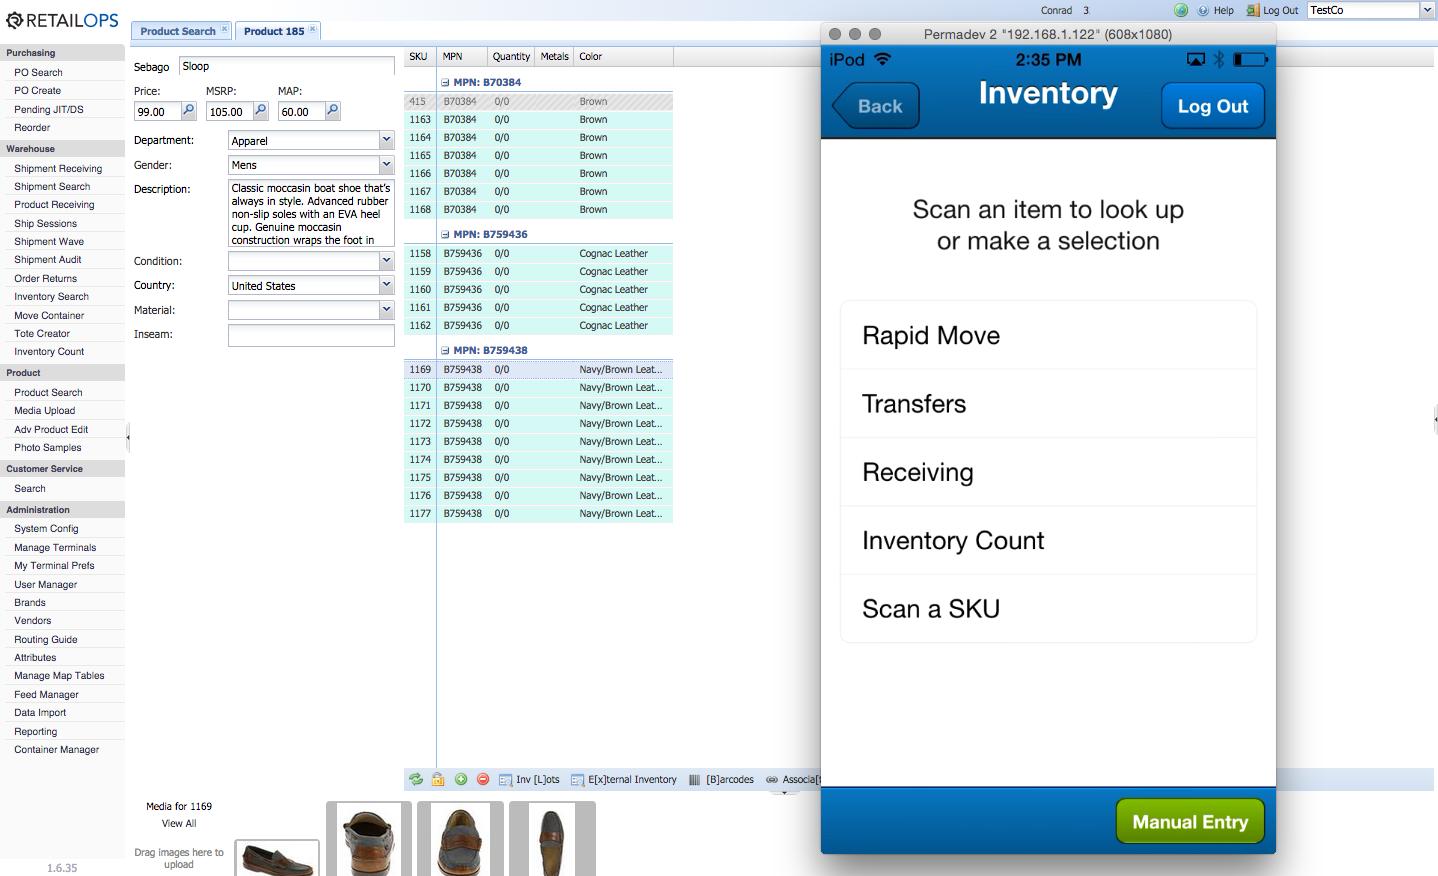 RetailOps - Inventory prompt